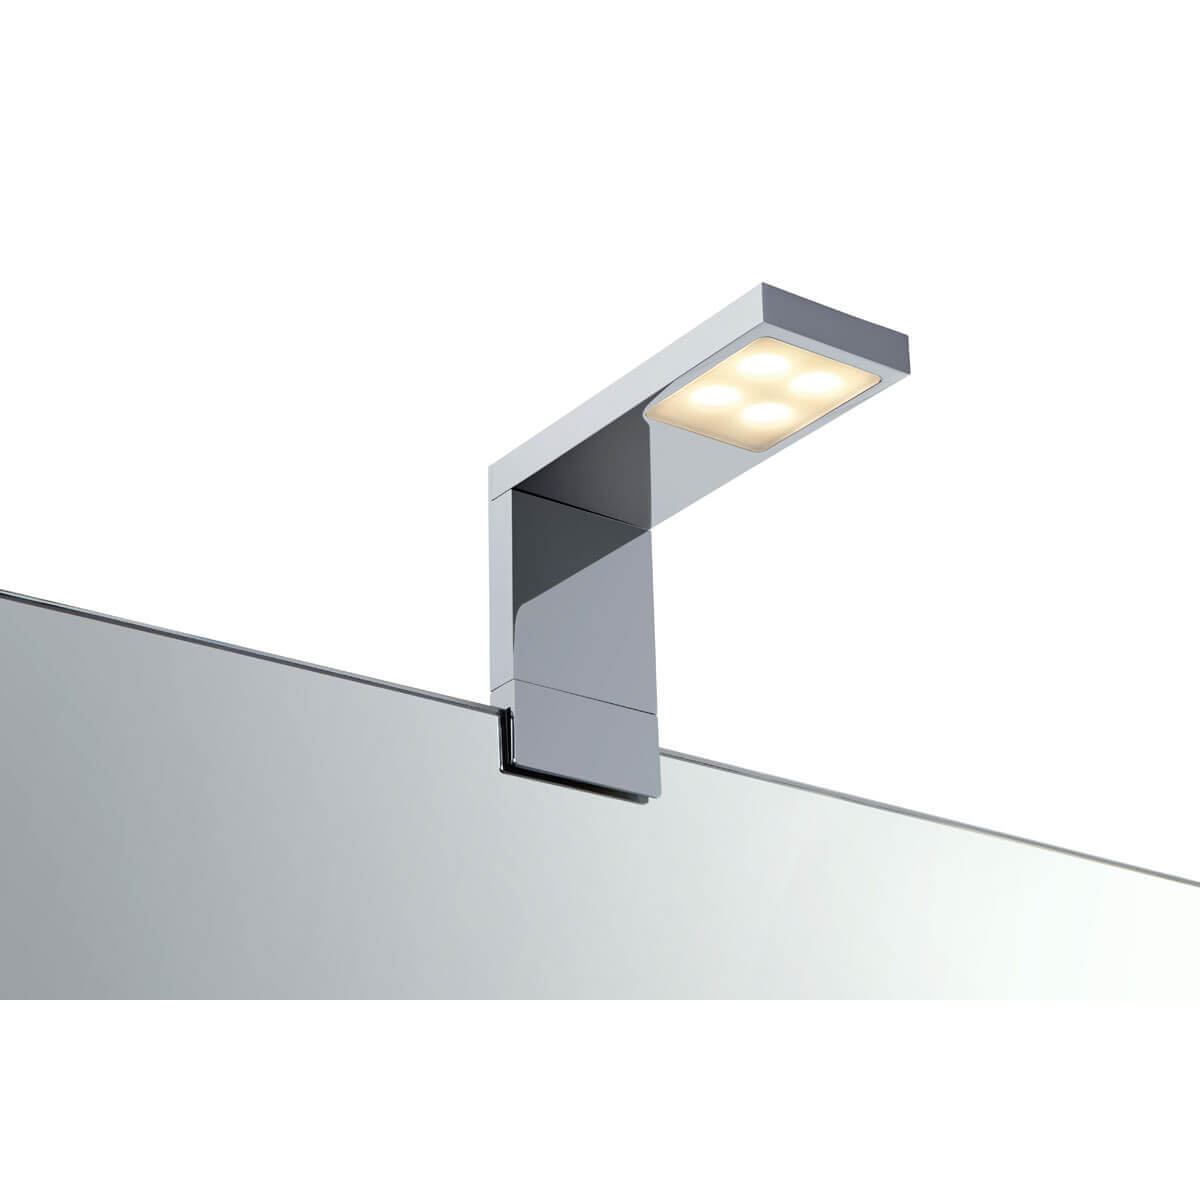 Подсветка для зеркал Markslojd Rennes 106577 to4rooms зеркало rennes